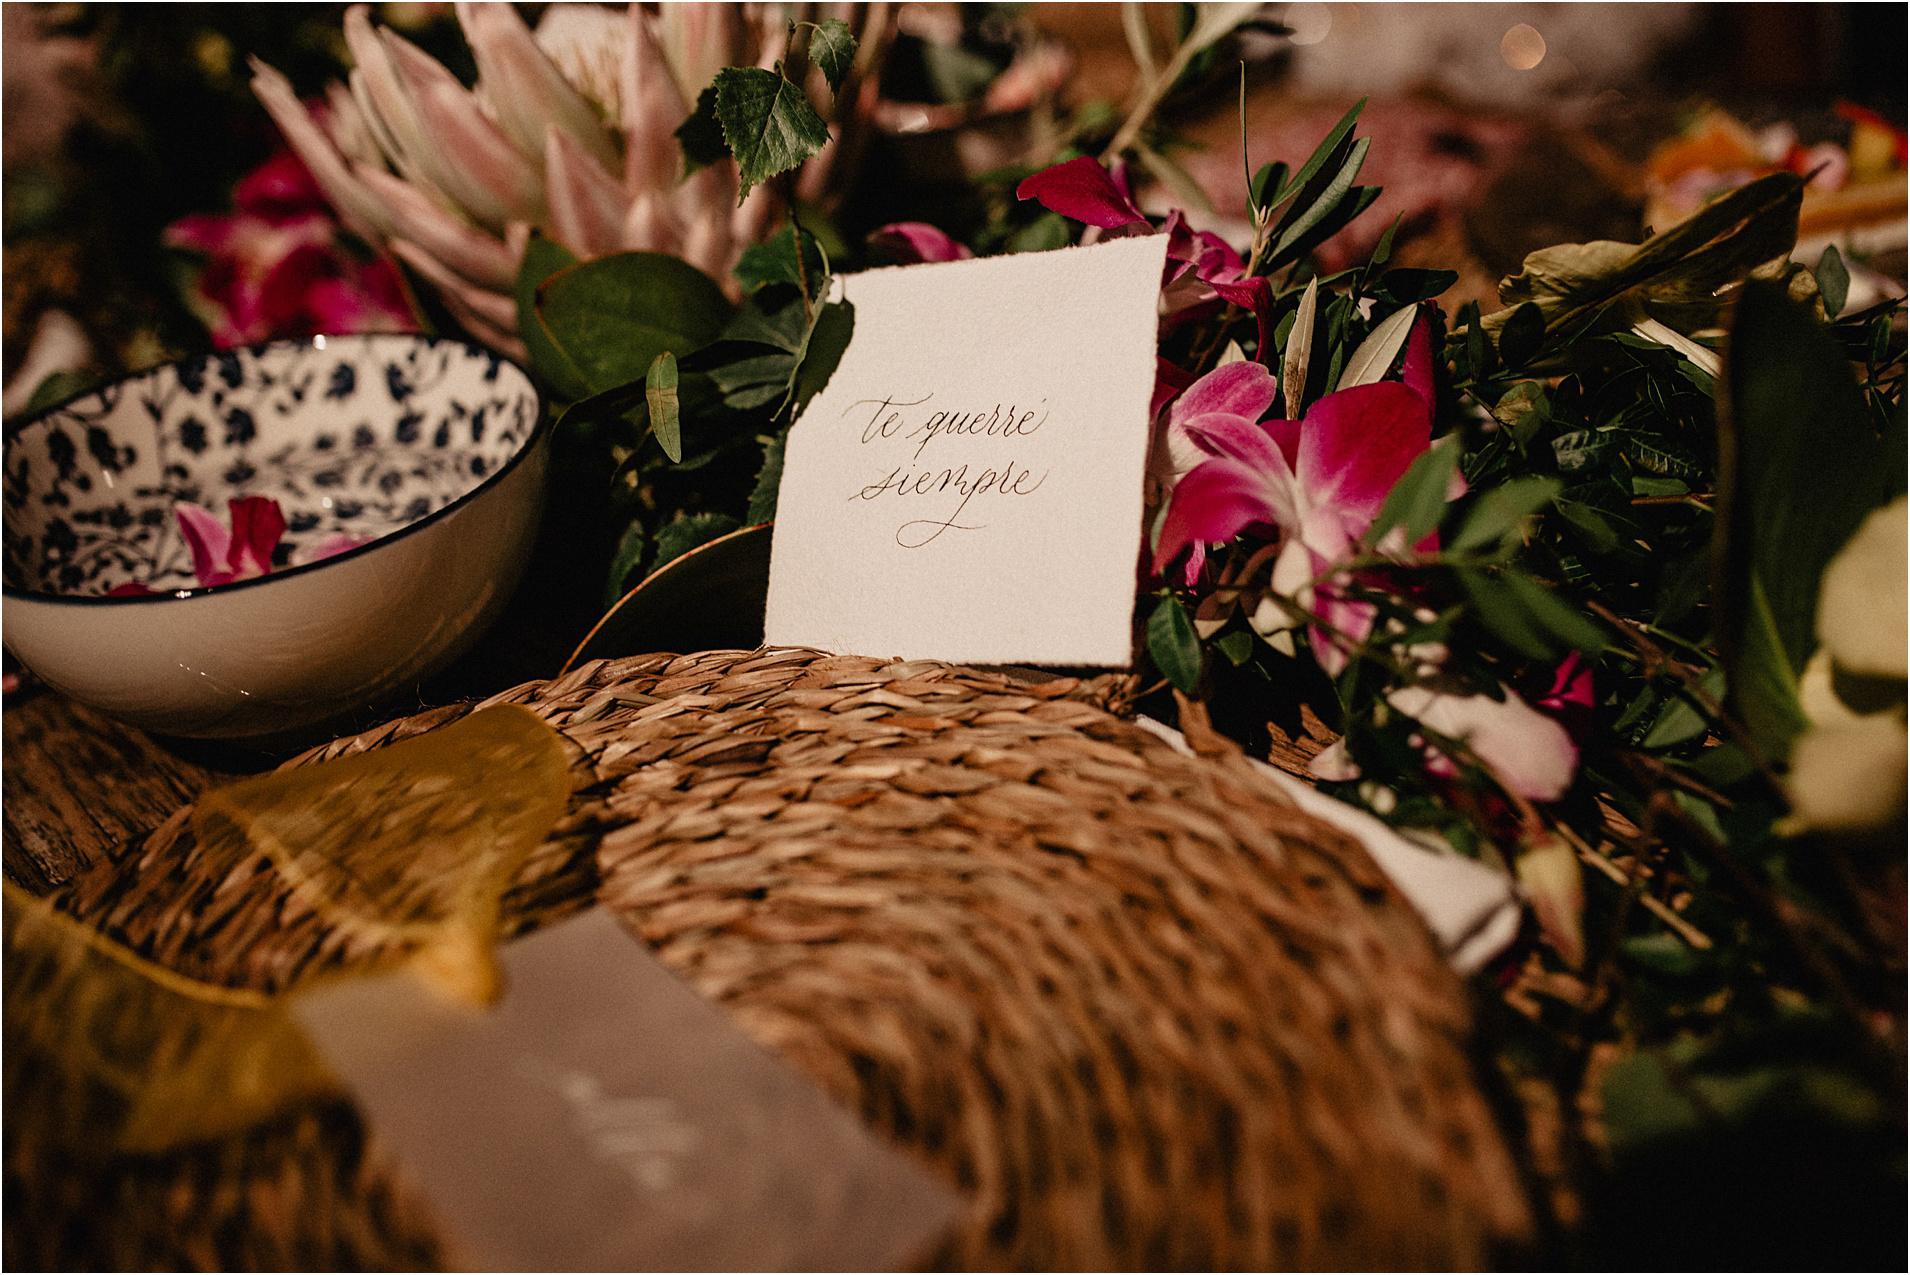 Fotografía y video en Palacio de Arbaisenea Bodas San Sebastián Donostia Guipuzcoa - Finca Arbaisenea by Maher Catering Wedding films and photography-52.jpg